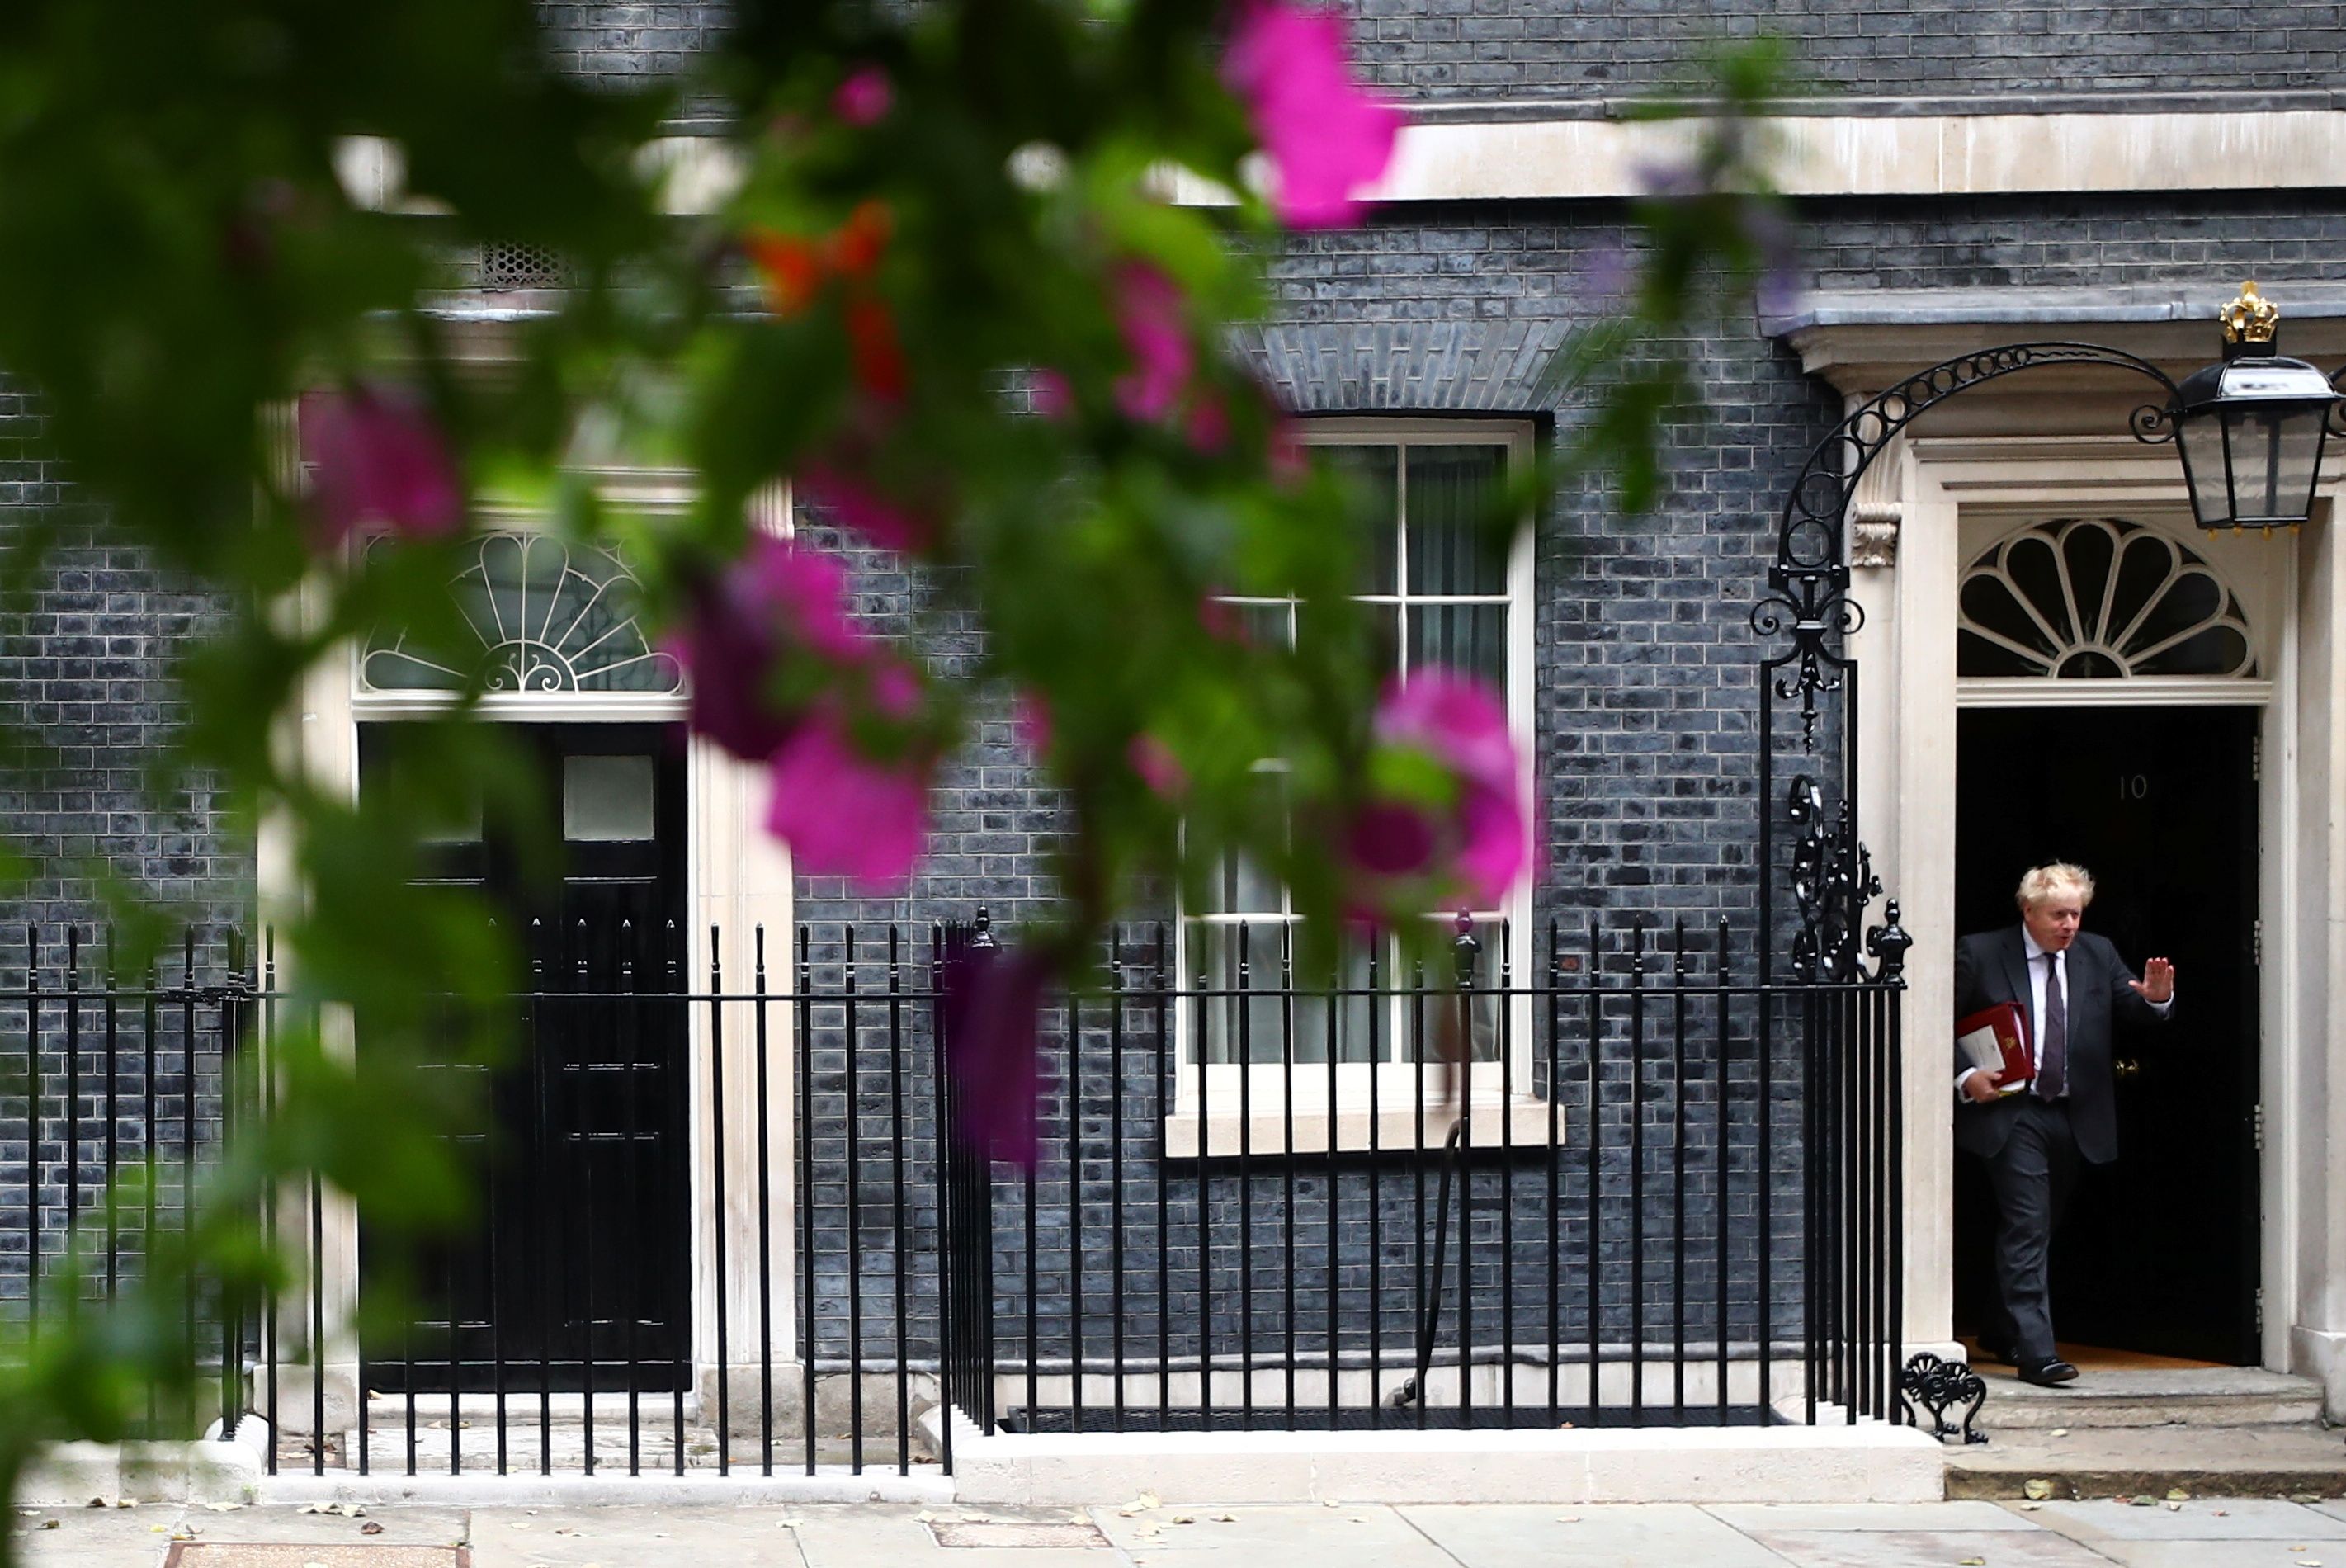 Britain's Prime Minister Boris Johnson gestures as he walks outside Downing Street in London, Britain, September 15, 2021. REUTERS/Hannah McKay